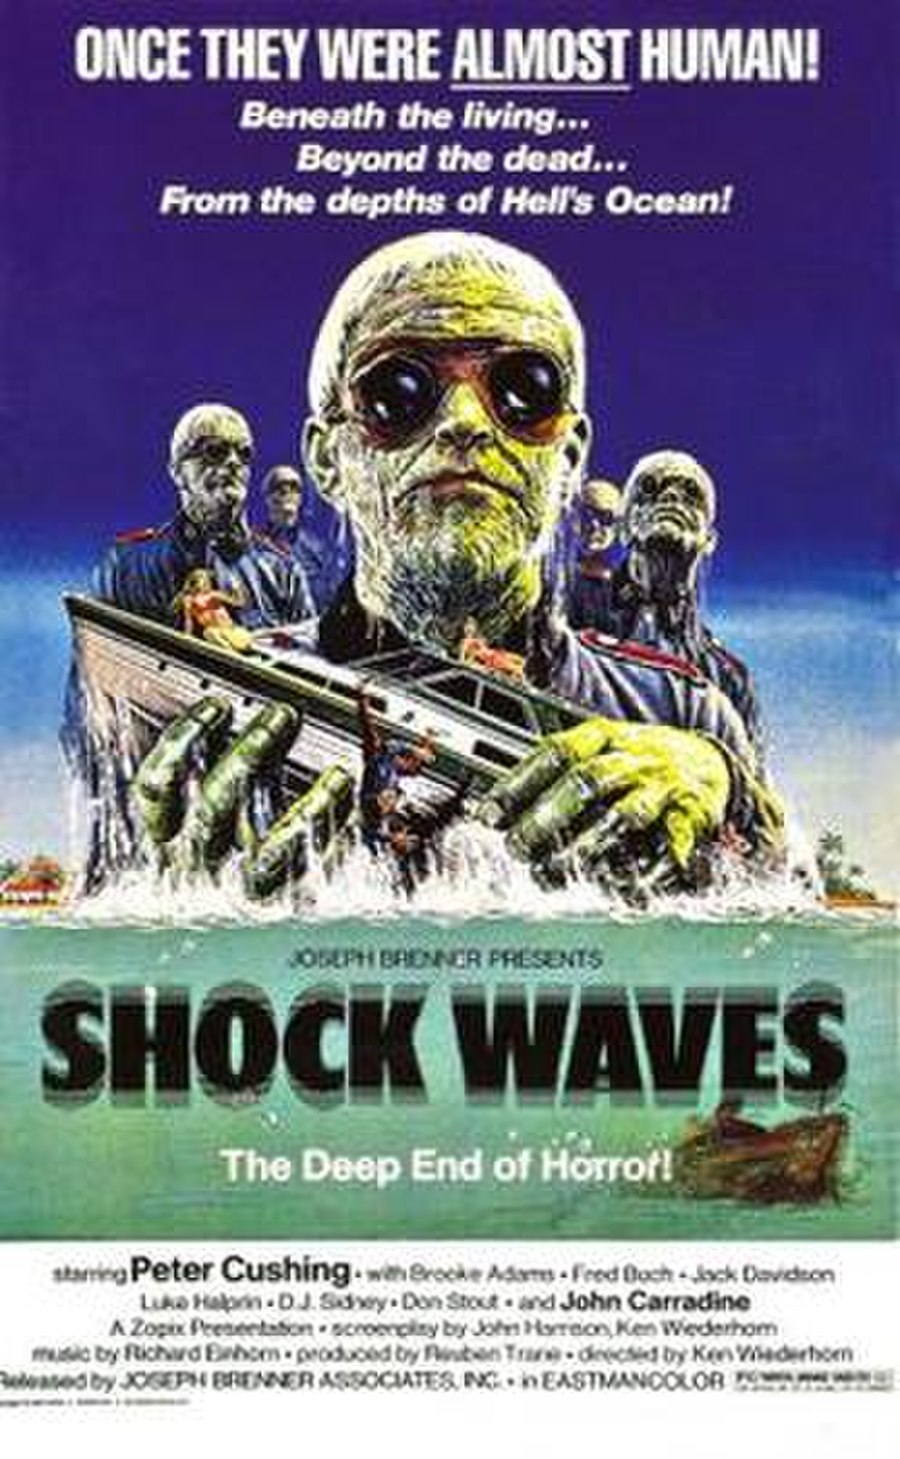 Shock Wavews